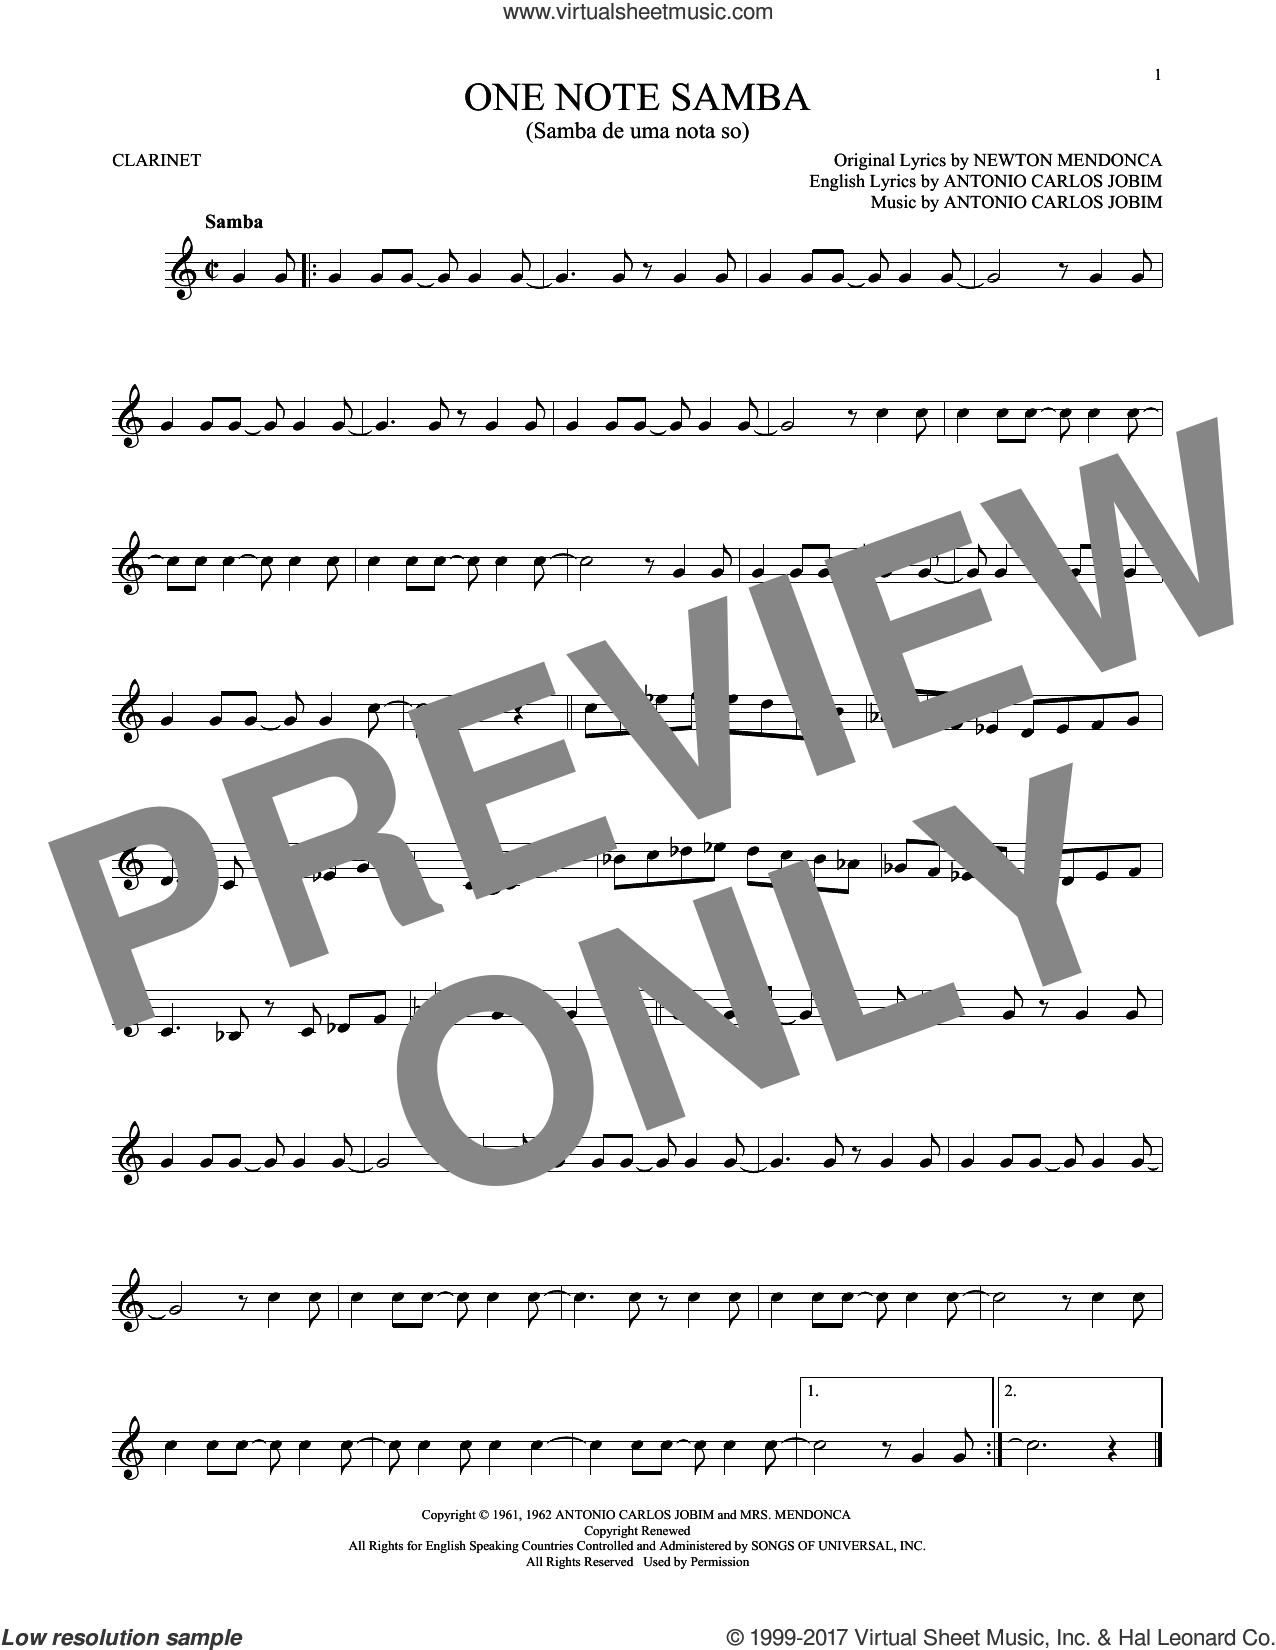 One Note Samba (Samba De Uma Nota So) sheet music for clarinet solo by Antonio Carlos Jobim, Pat Thomas and Newton Mendonca, intermediate skill level